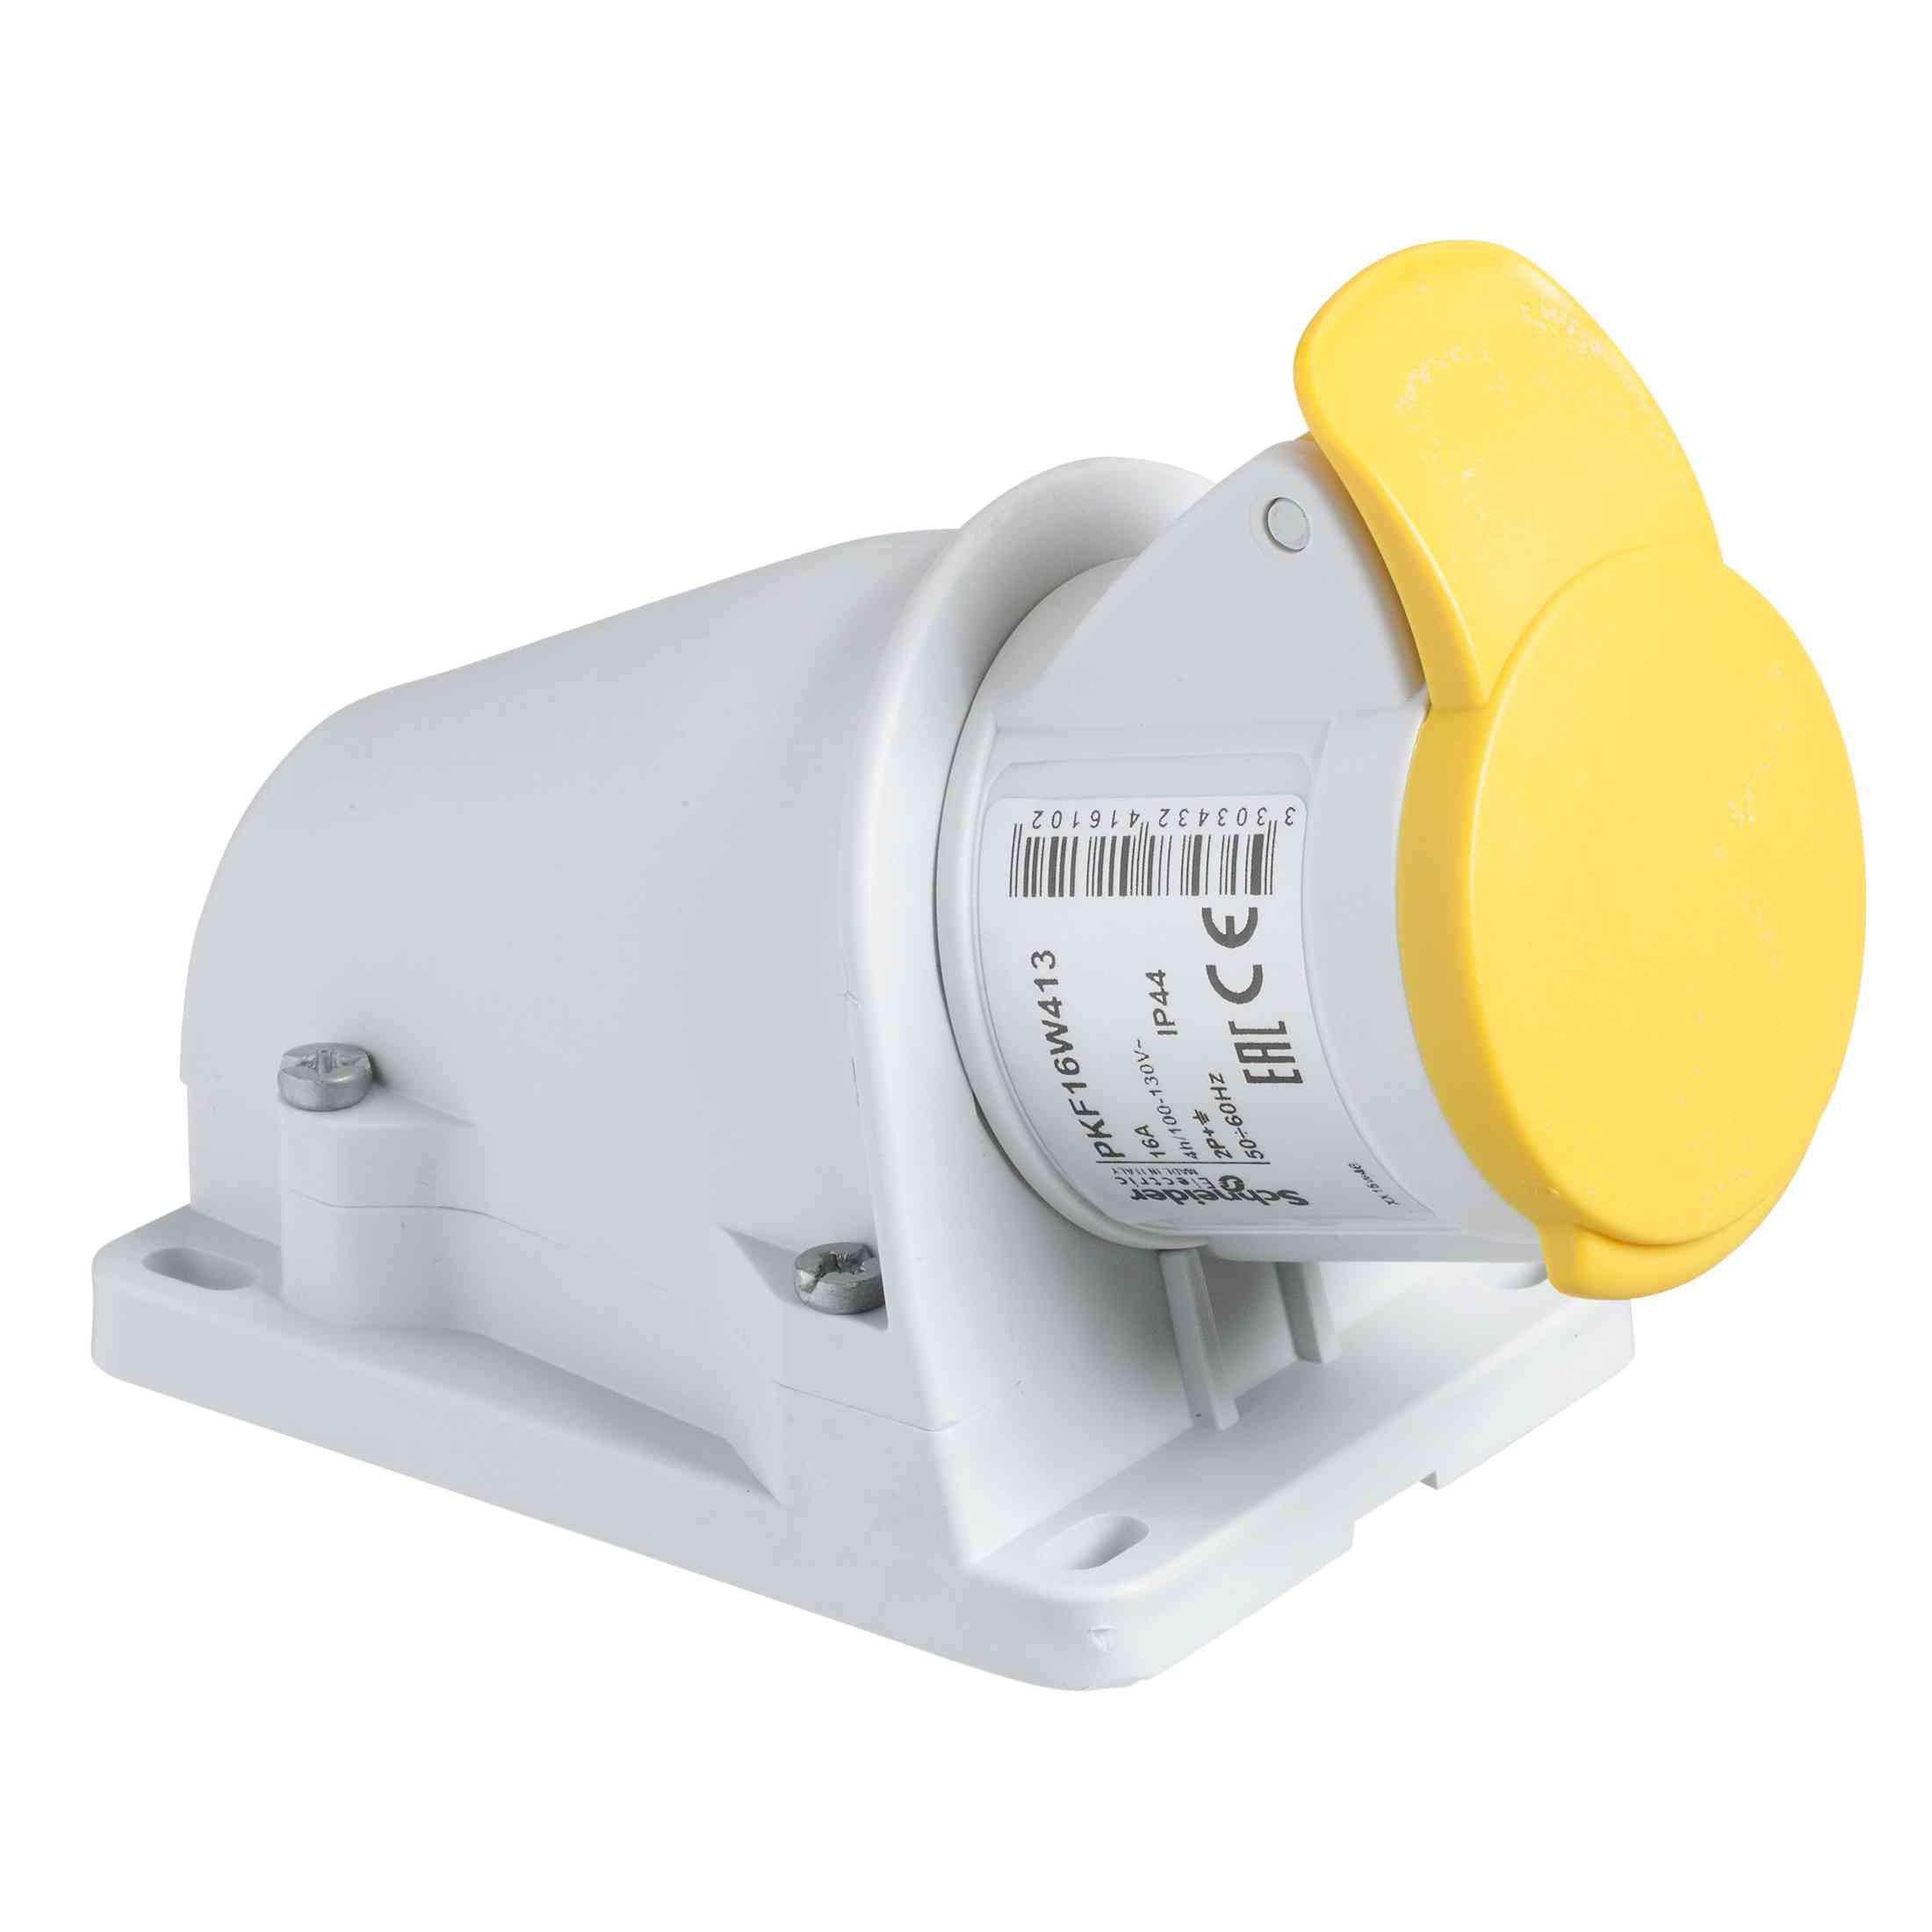 Vtičnica PratiKa - vijak - kotna - 16 A - 2P + E - 100 do 130 V AC - stena